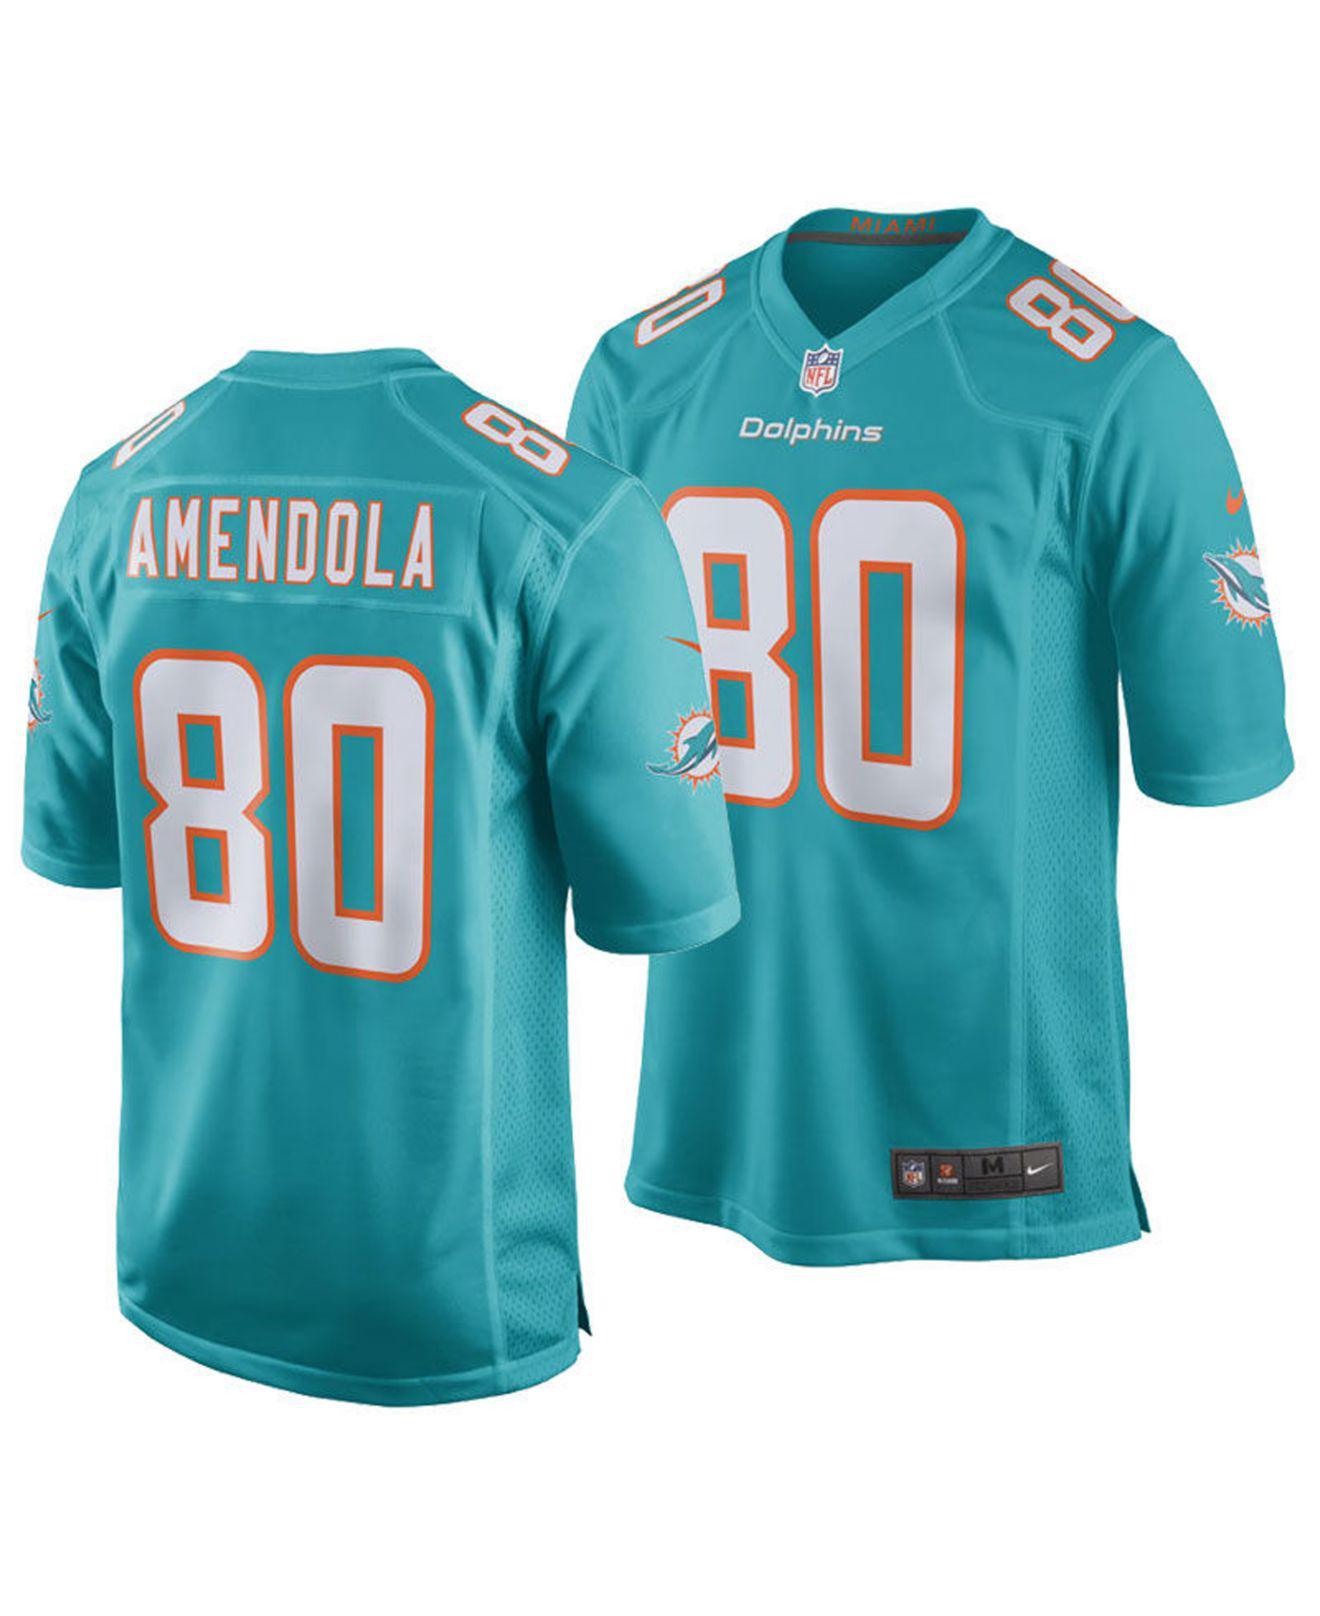 danny amendola throwback jersey